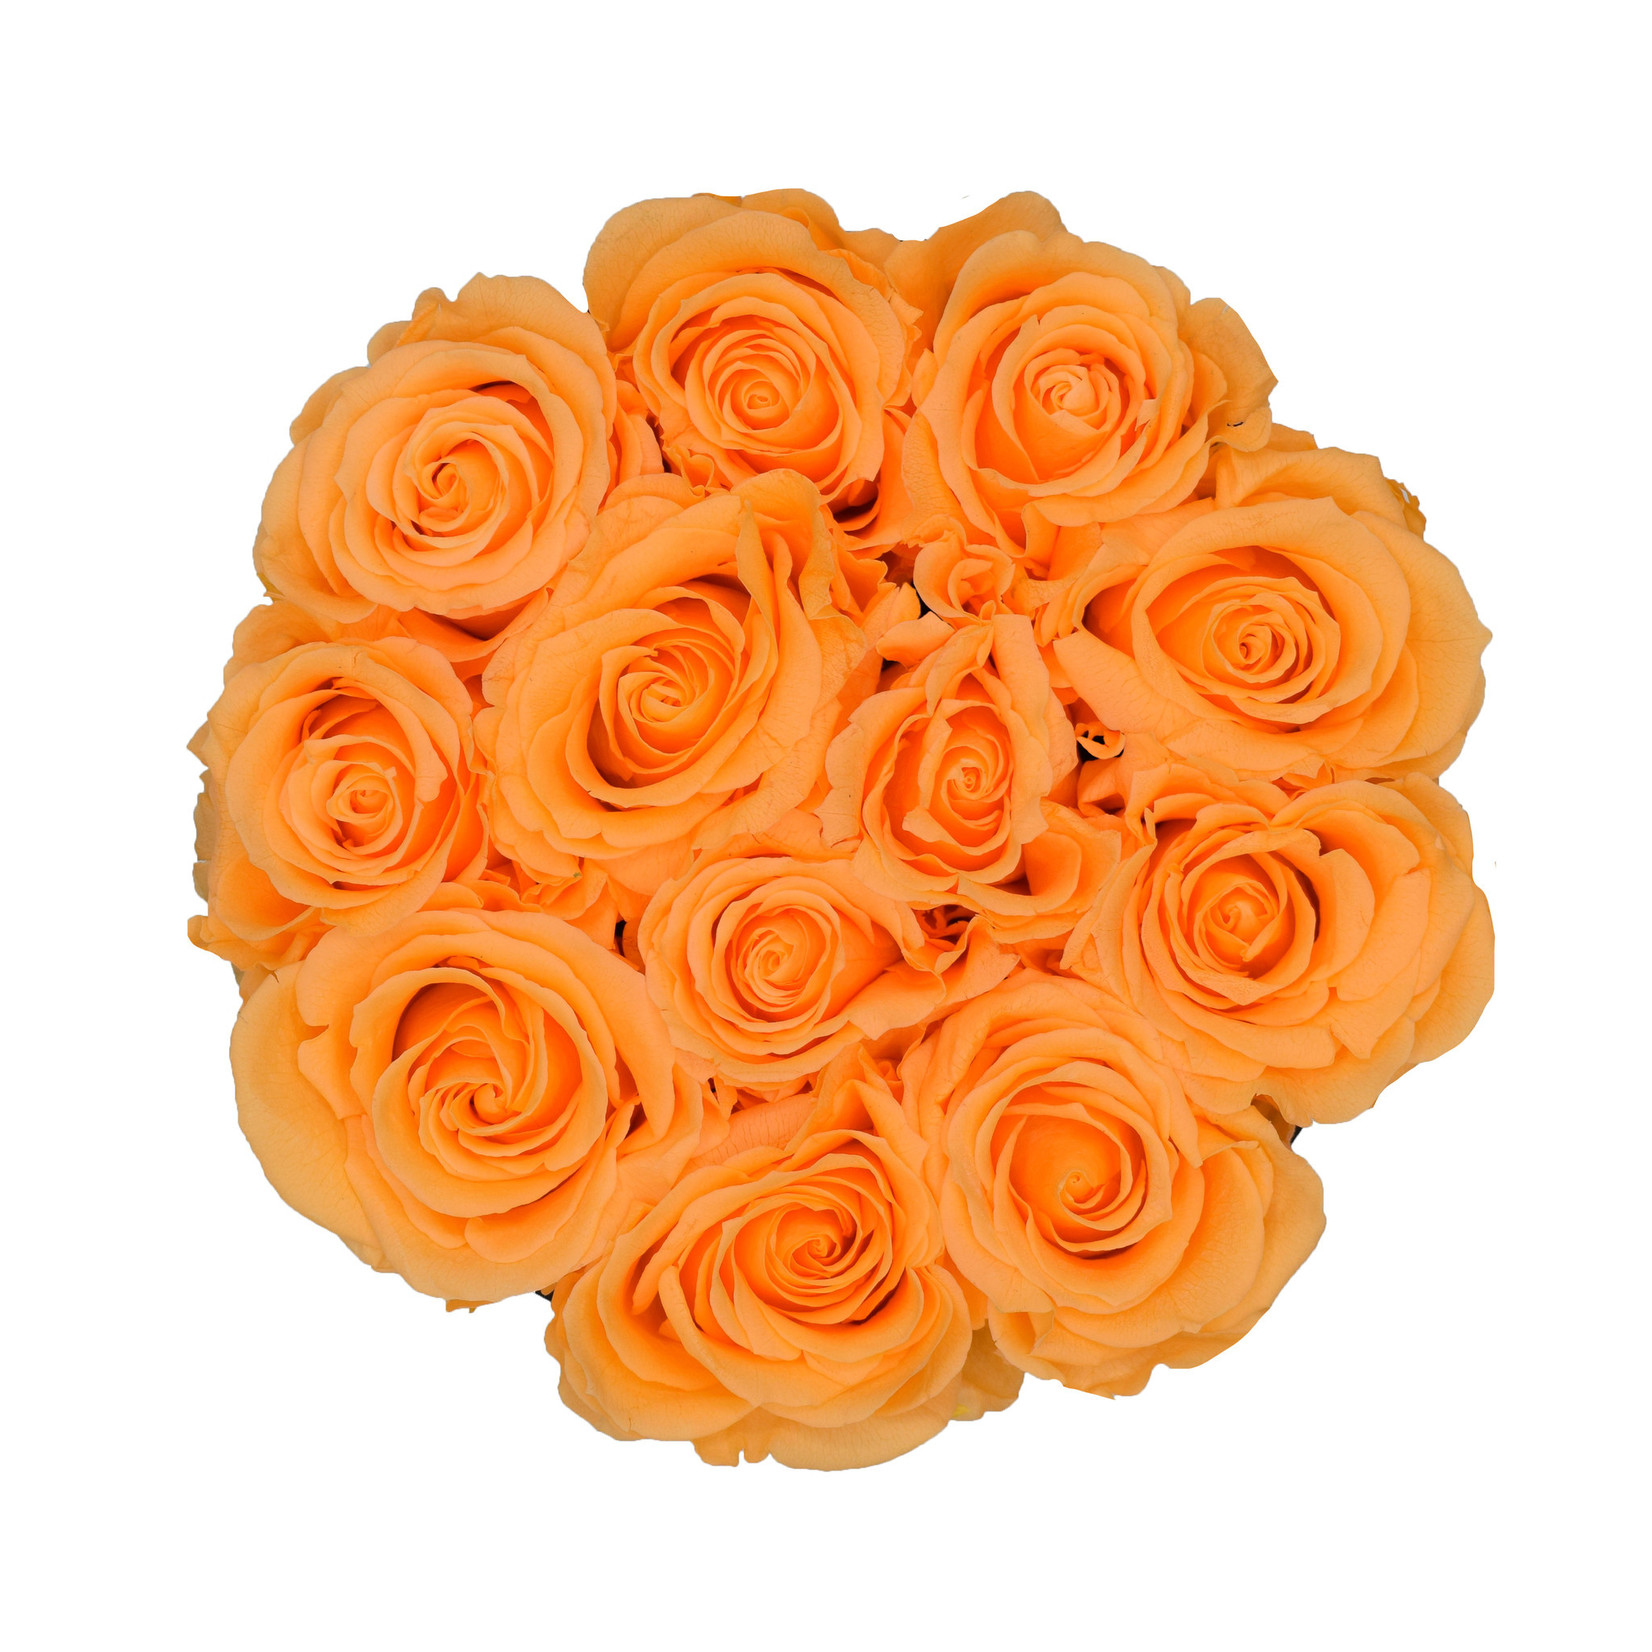 Small - Peach Endless Roses - White Box